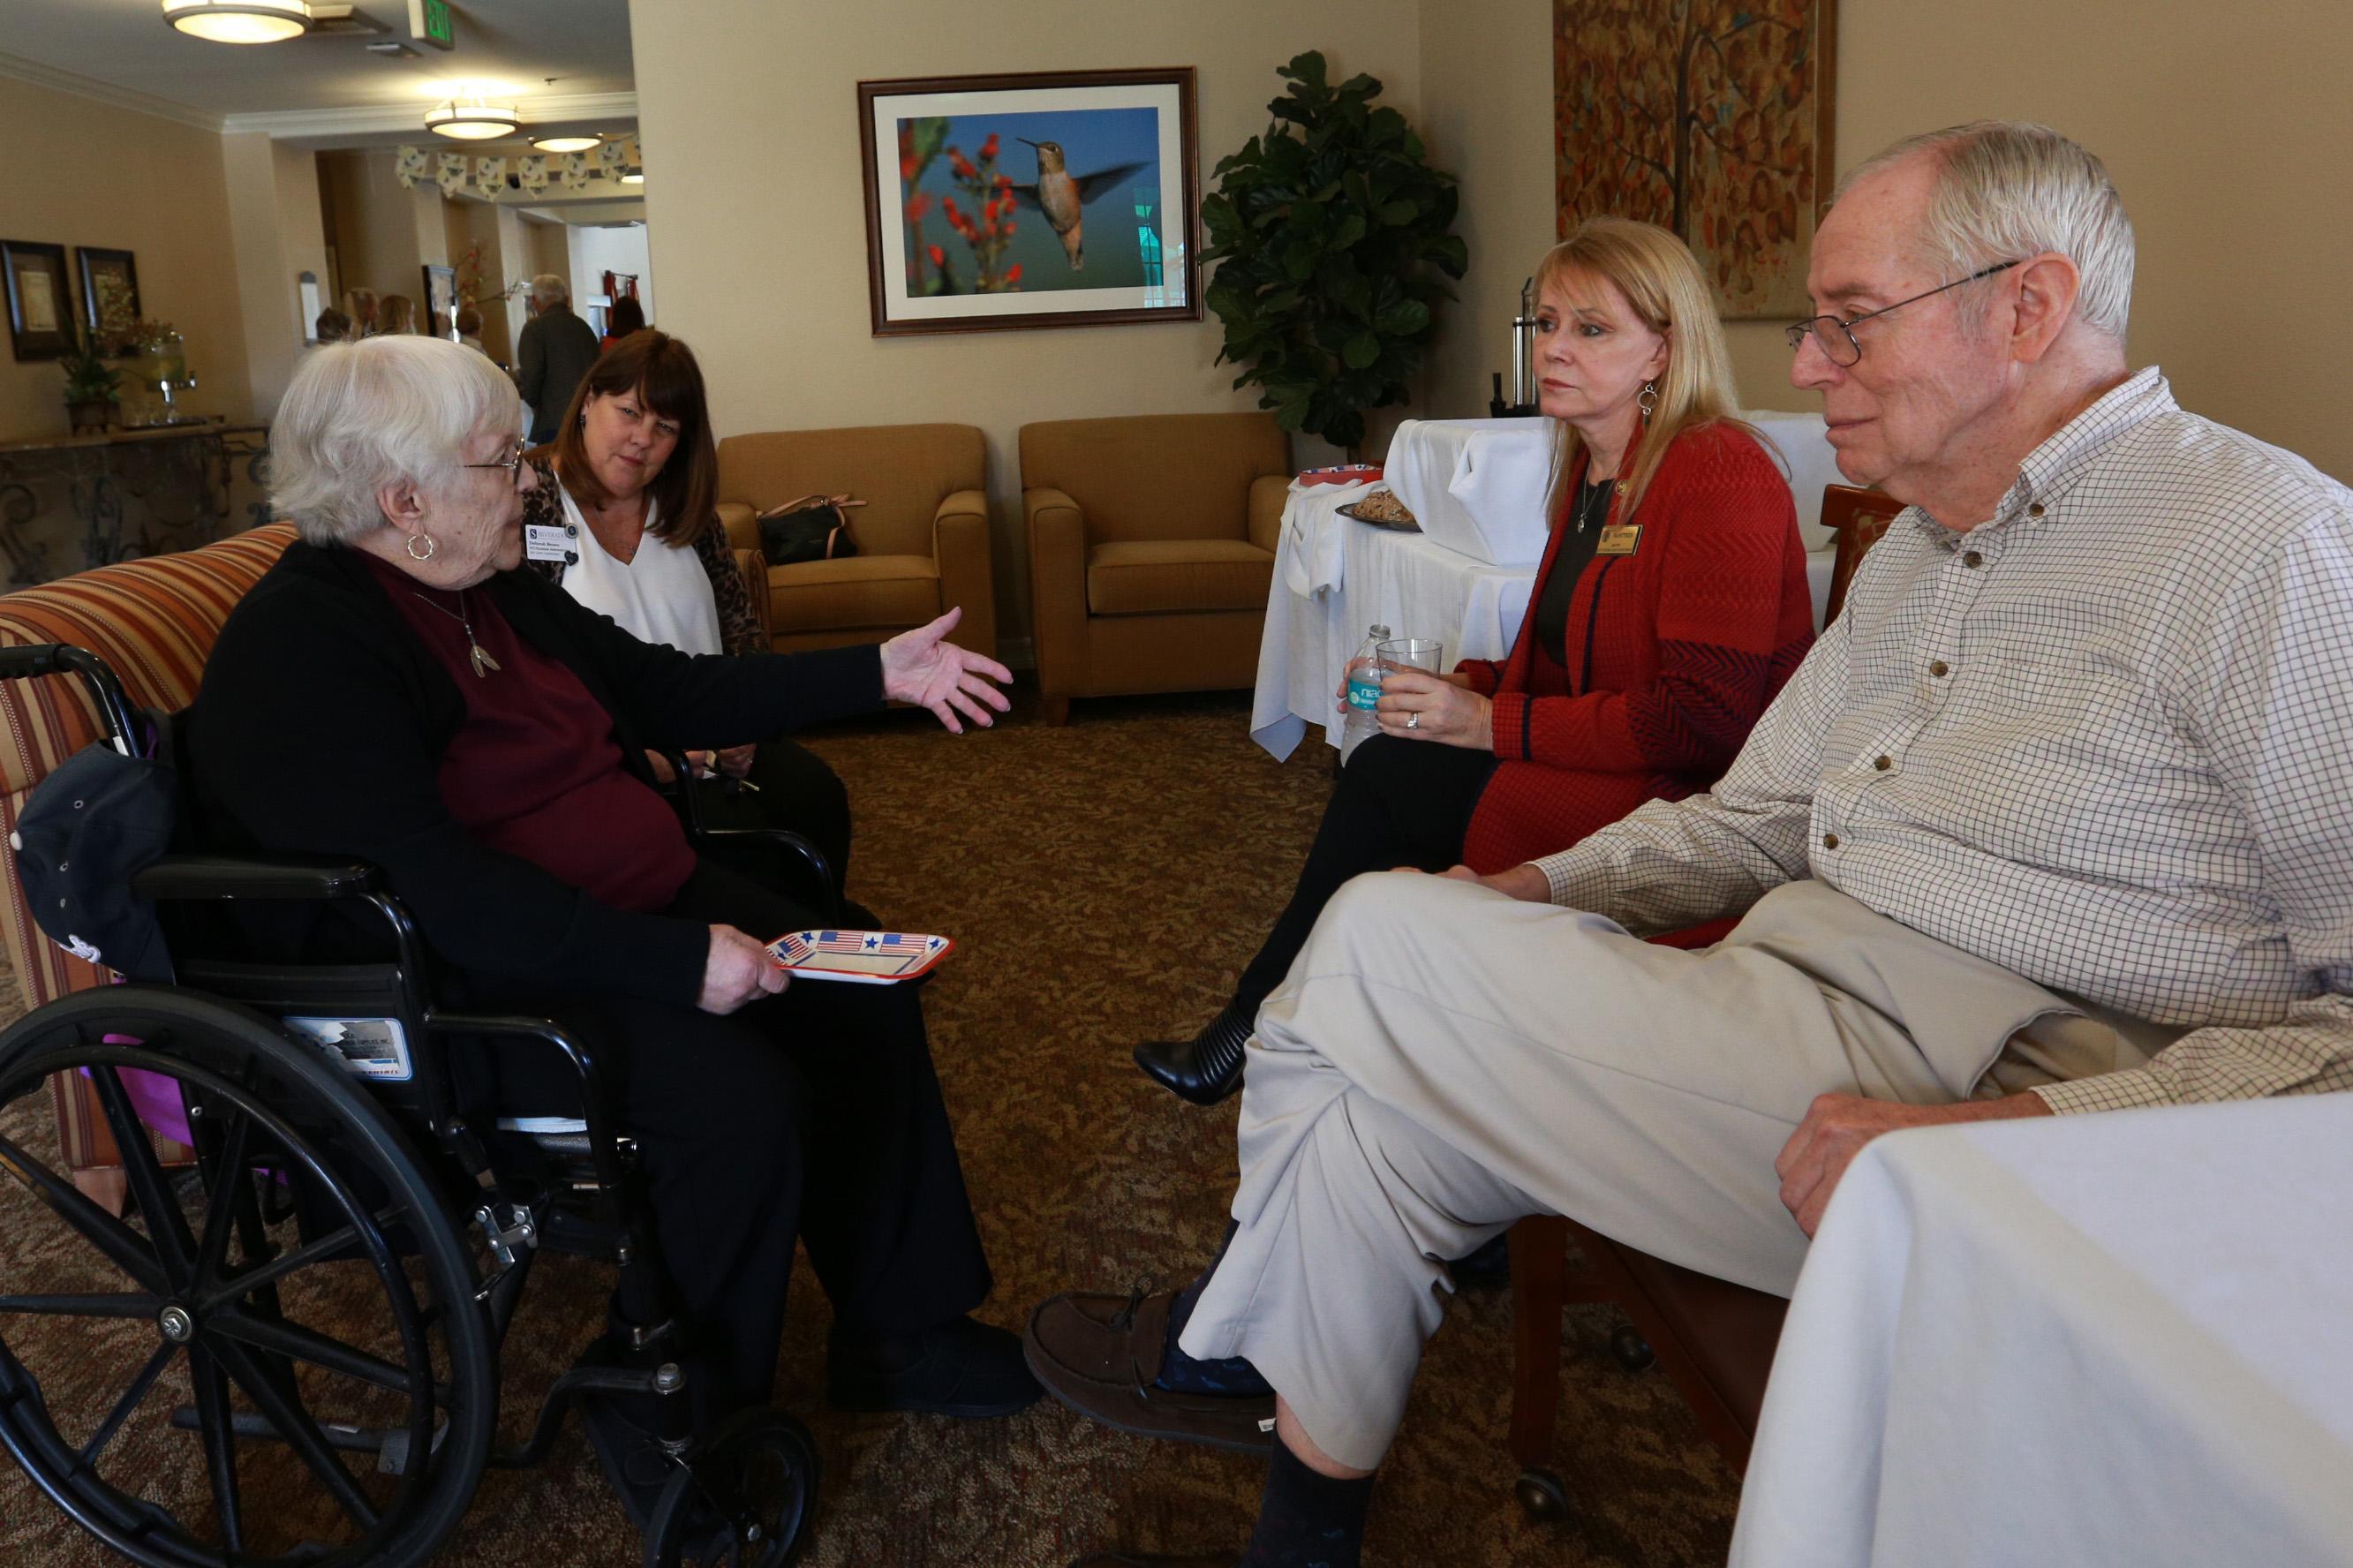 From left to right:Mary Janney; Deborah Brown, Silverado Assistant Administrator; Mayor Pam Patterson and Wayne Peterson. Photo: Courtesy of Silverado San Juan Capistrano